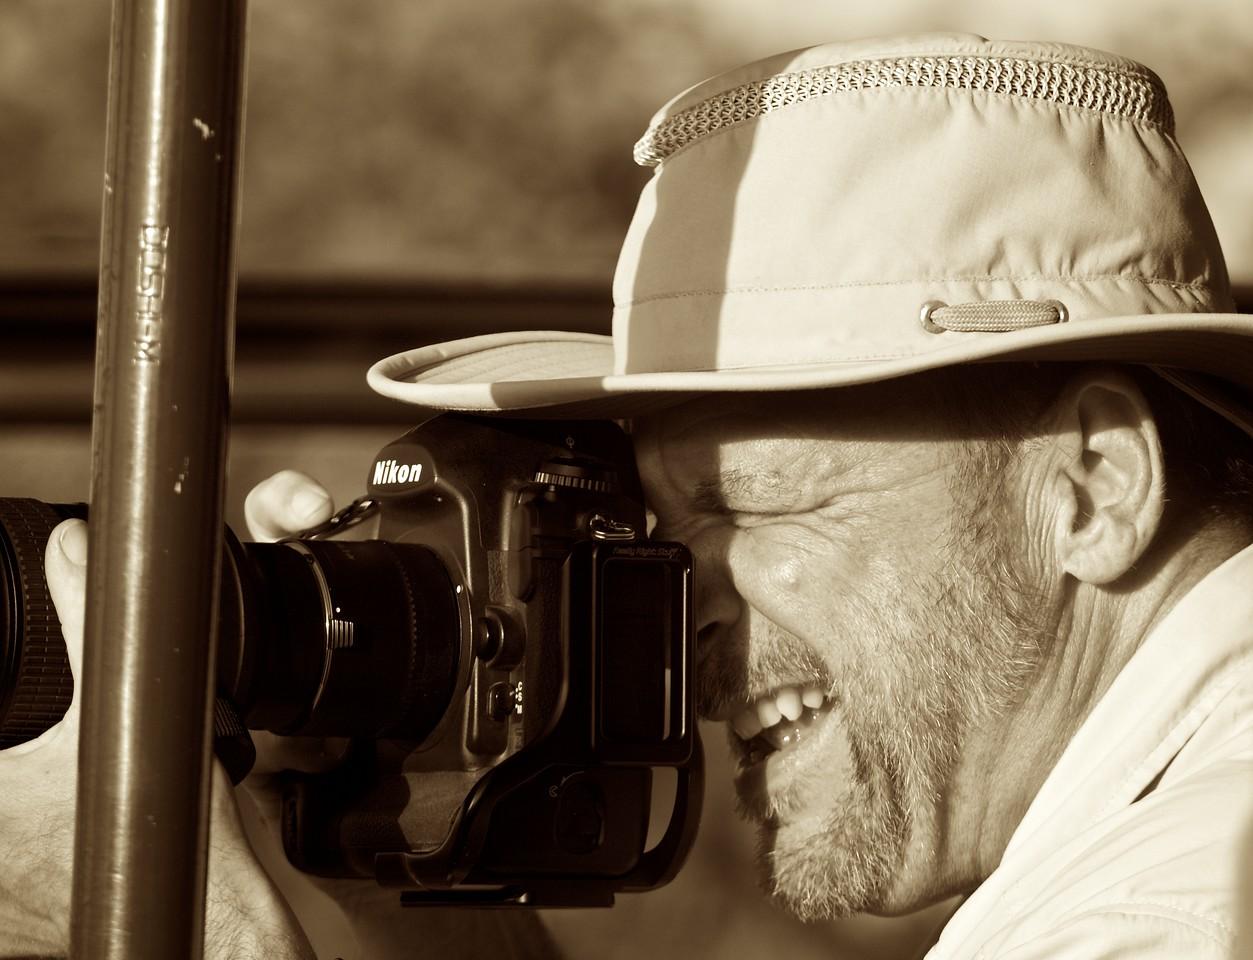 Bill, Lewa, Kenya